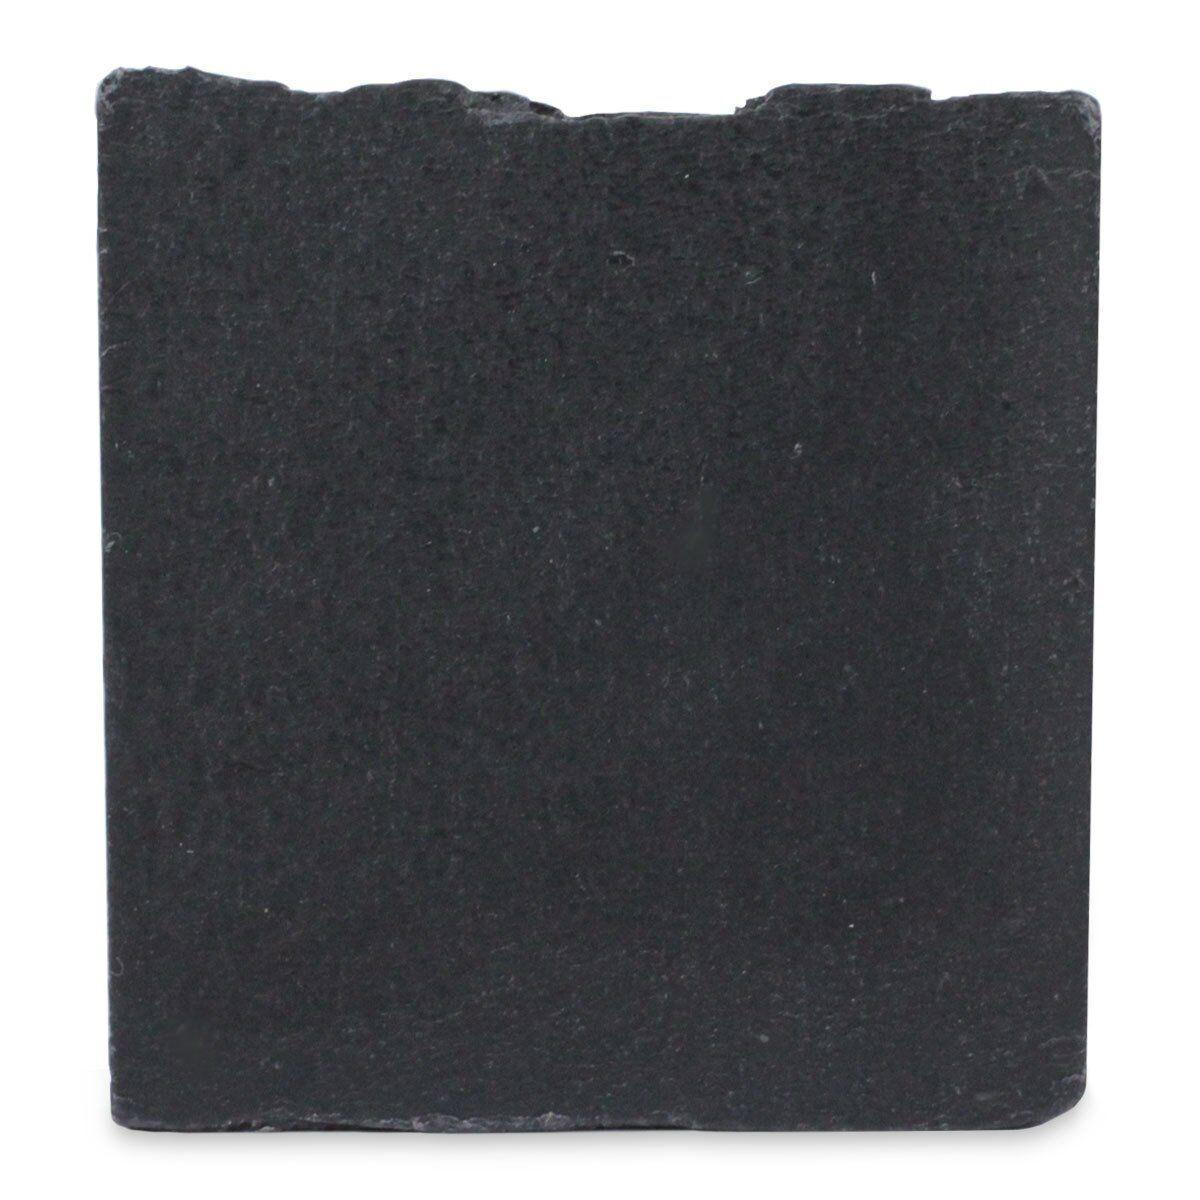 Chidoriya - Bamboo Charcoal Soap